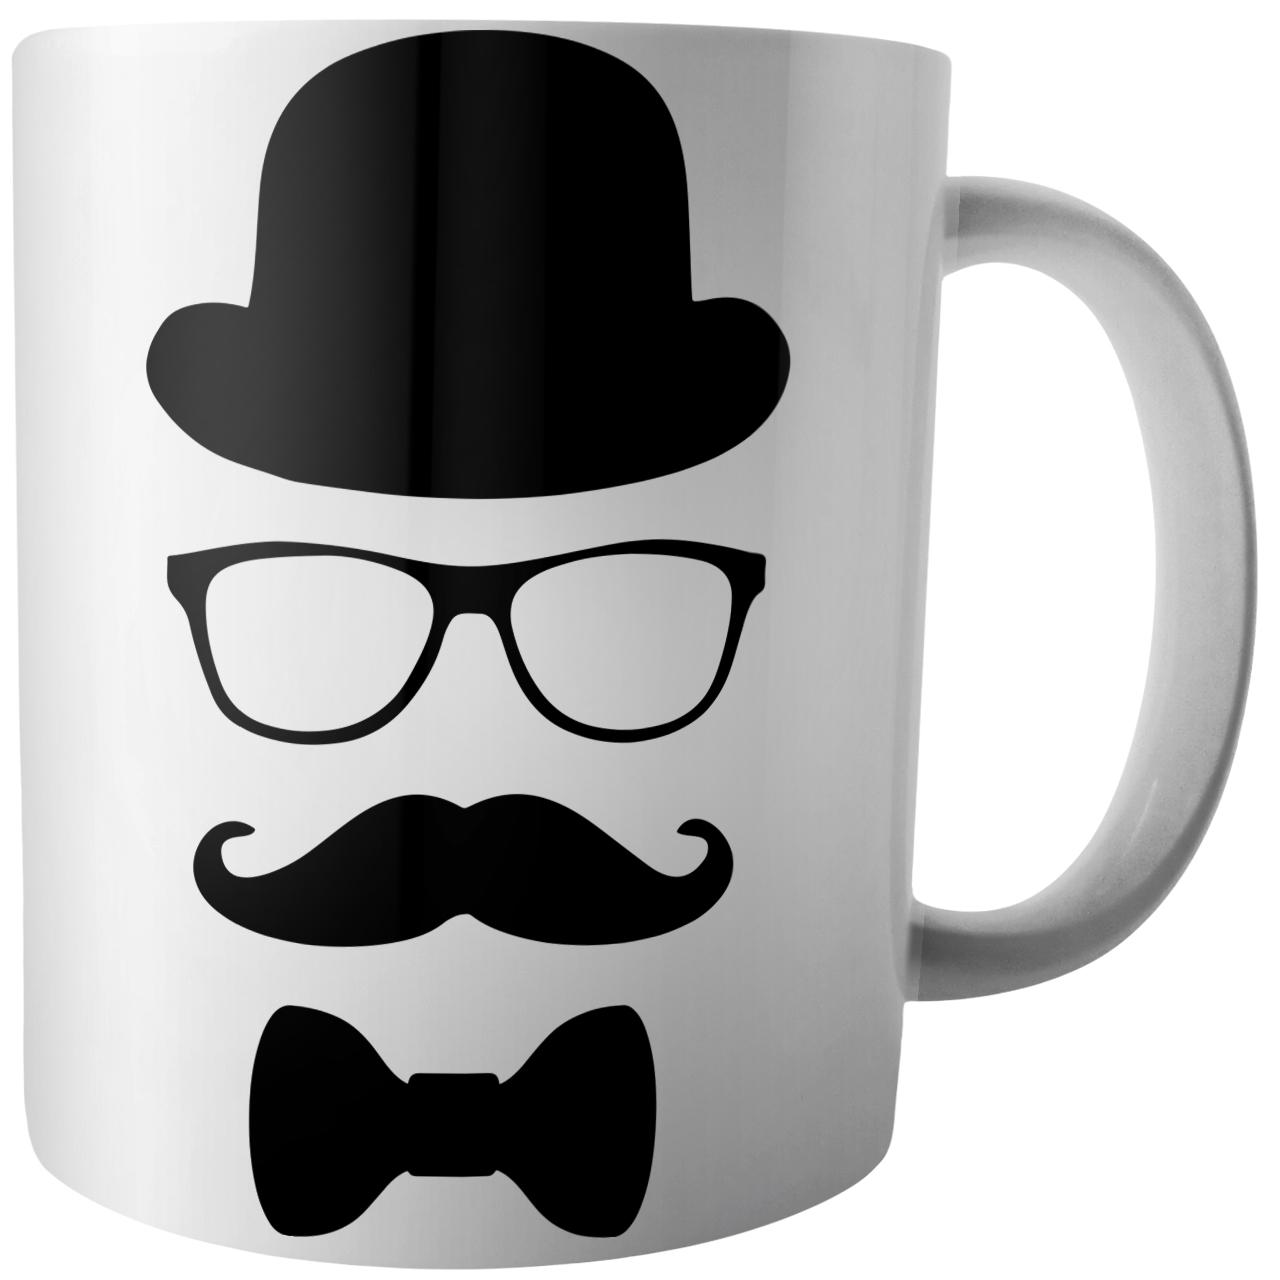 عکس ماگ آکو طرح عینک و سیبیل کد B304